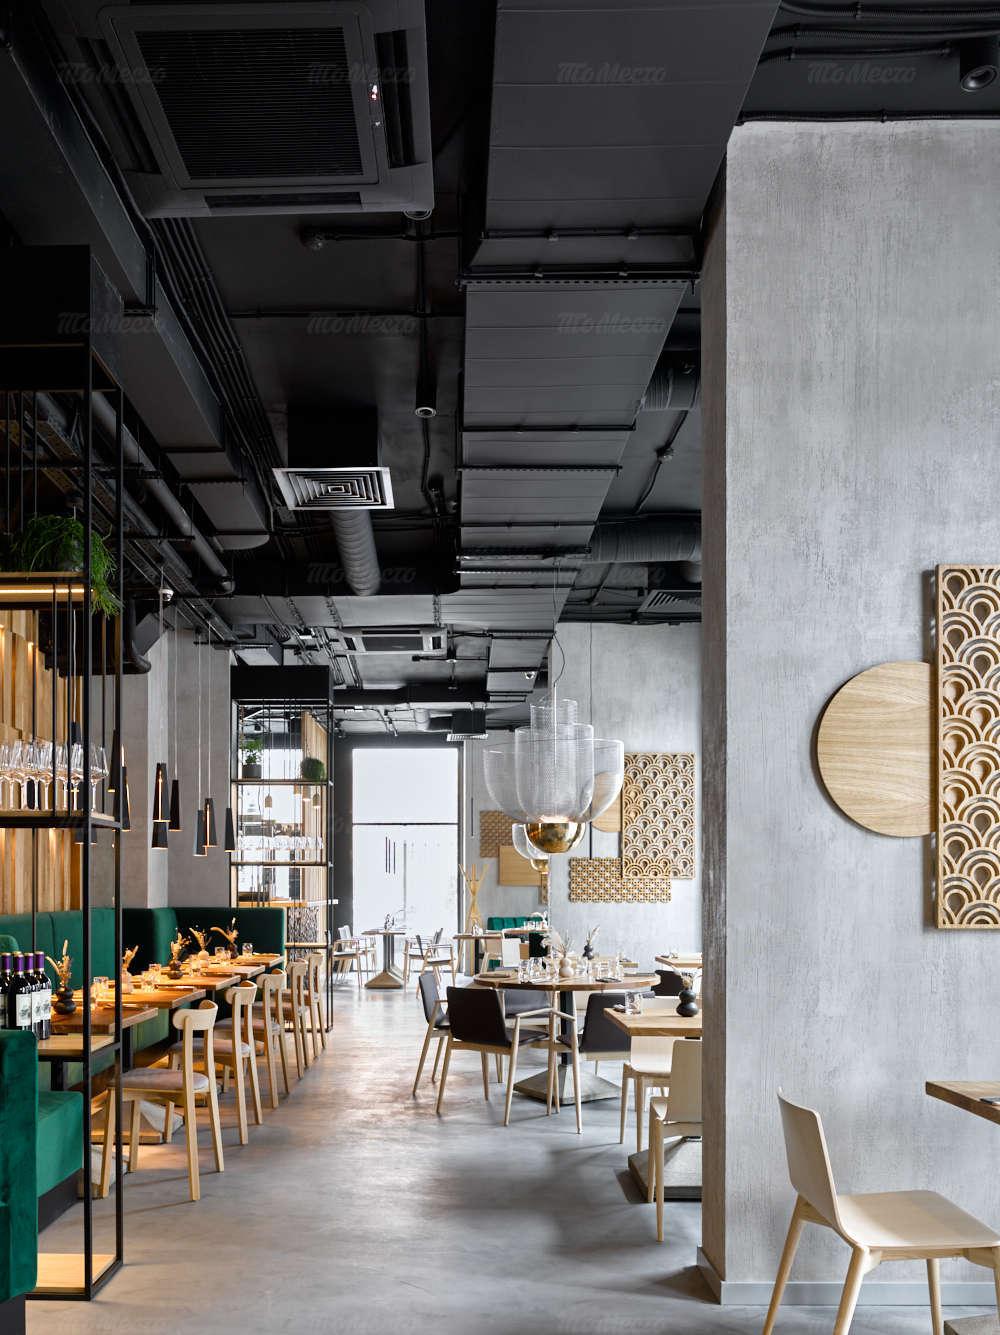 Ресторан Asia Inn (Азиа Инн) на бульваре Генерала Карбышева фото 4